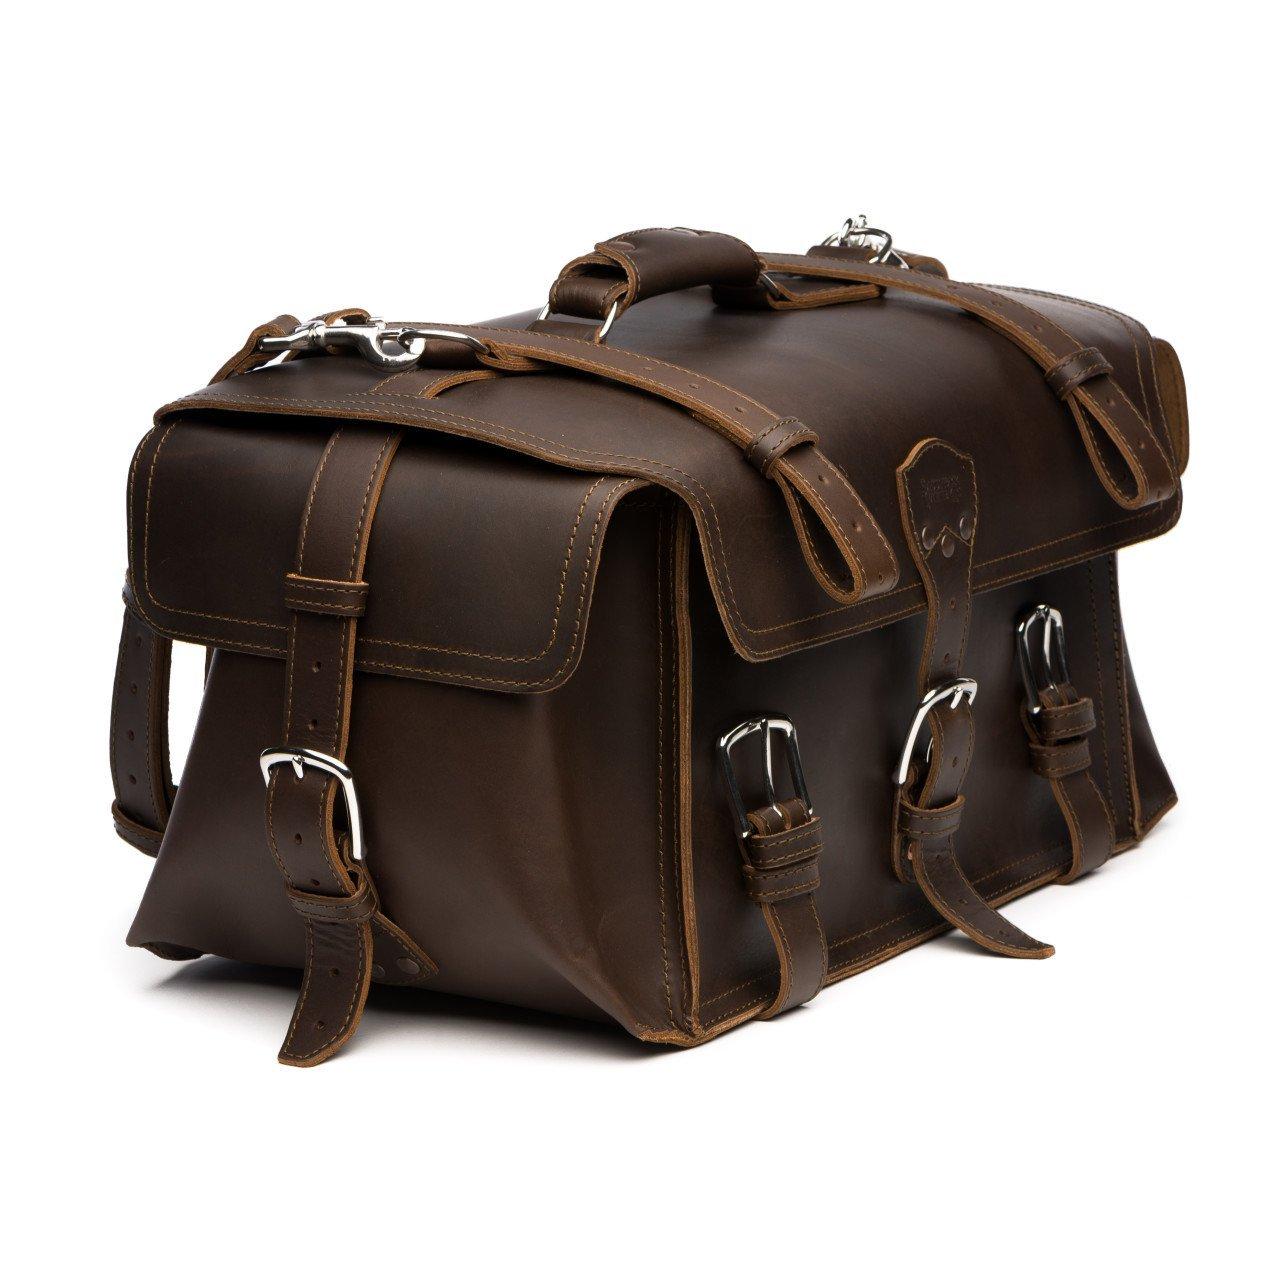 Saddleback Leather Side Pocket Duffel - Best Carry On, Travel Duffel Bag - 100 Year Warranty